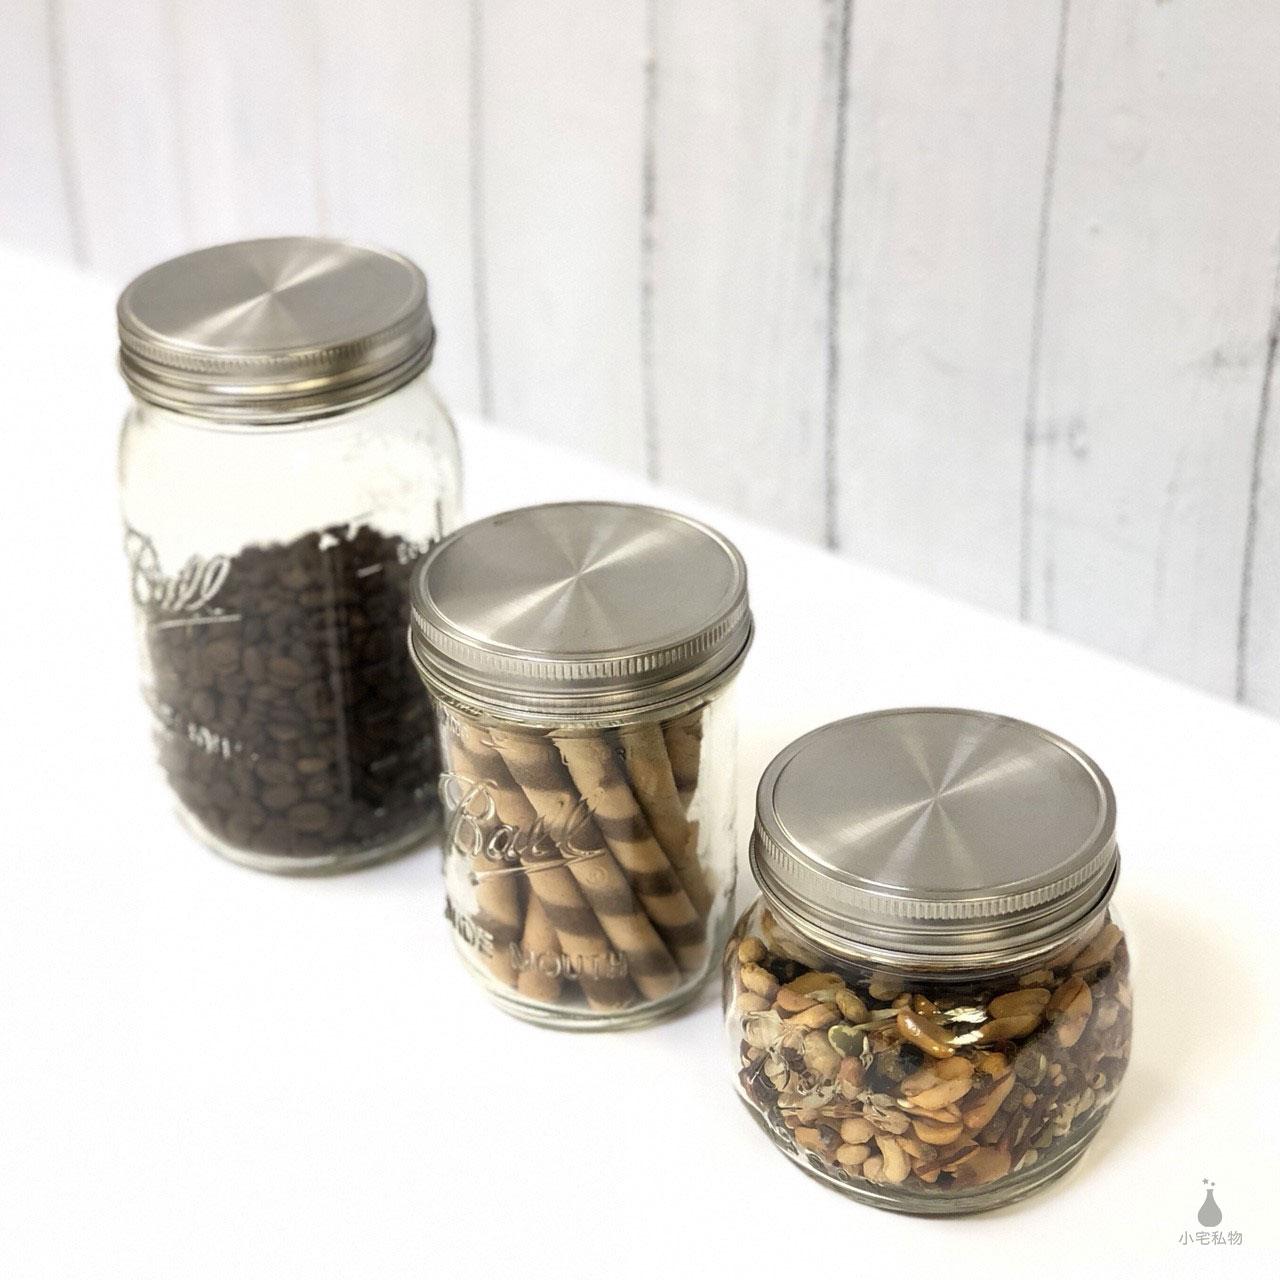 Ball 梅森罐+不鏽鋼密封蓋組 (窄口/寬口)